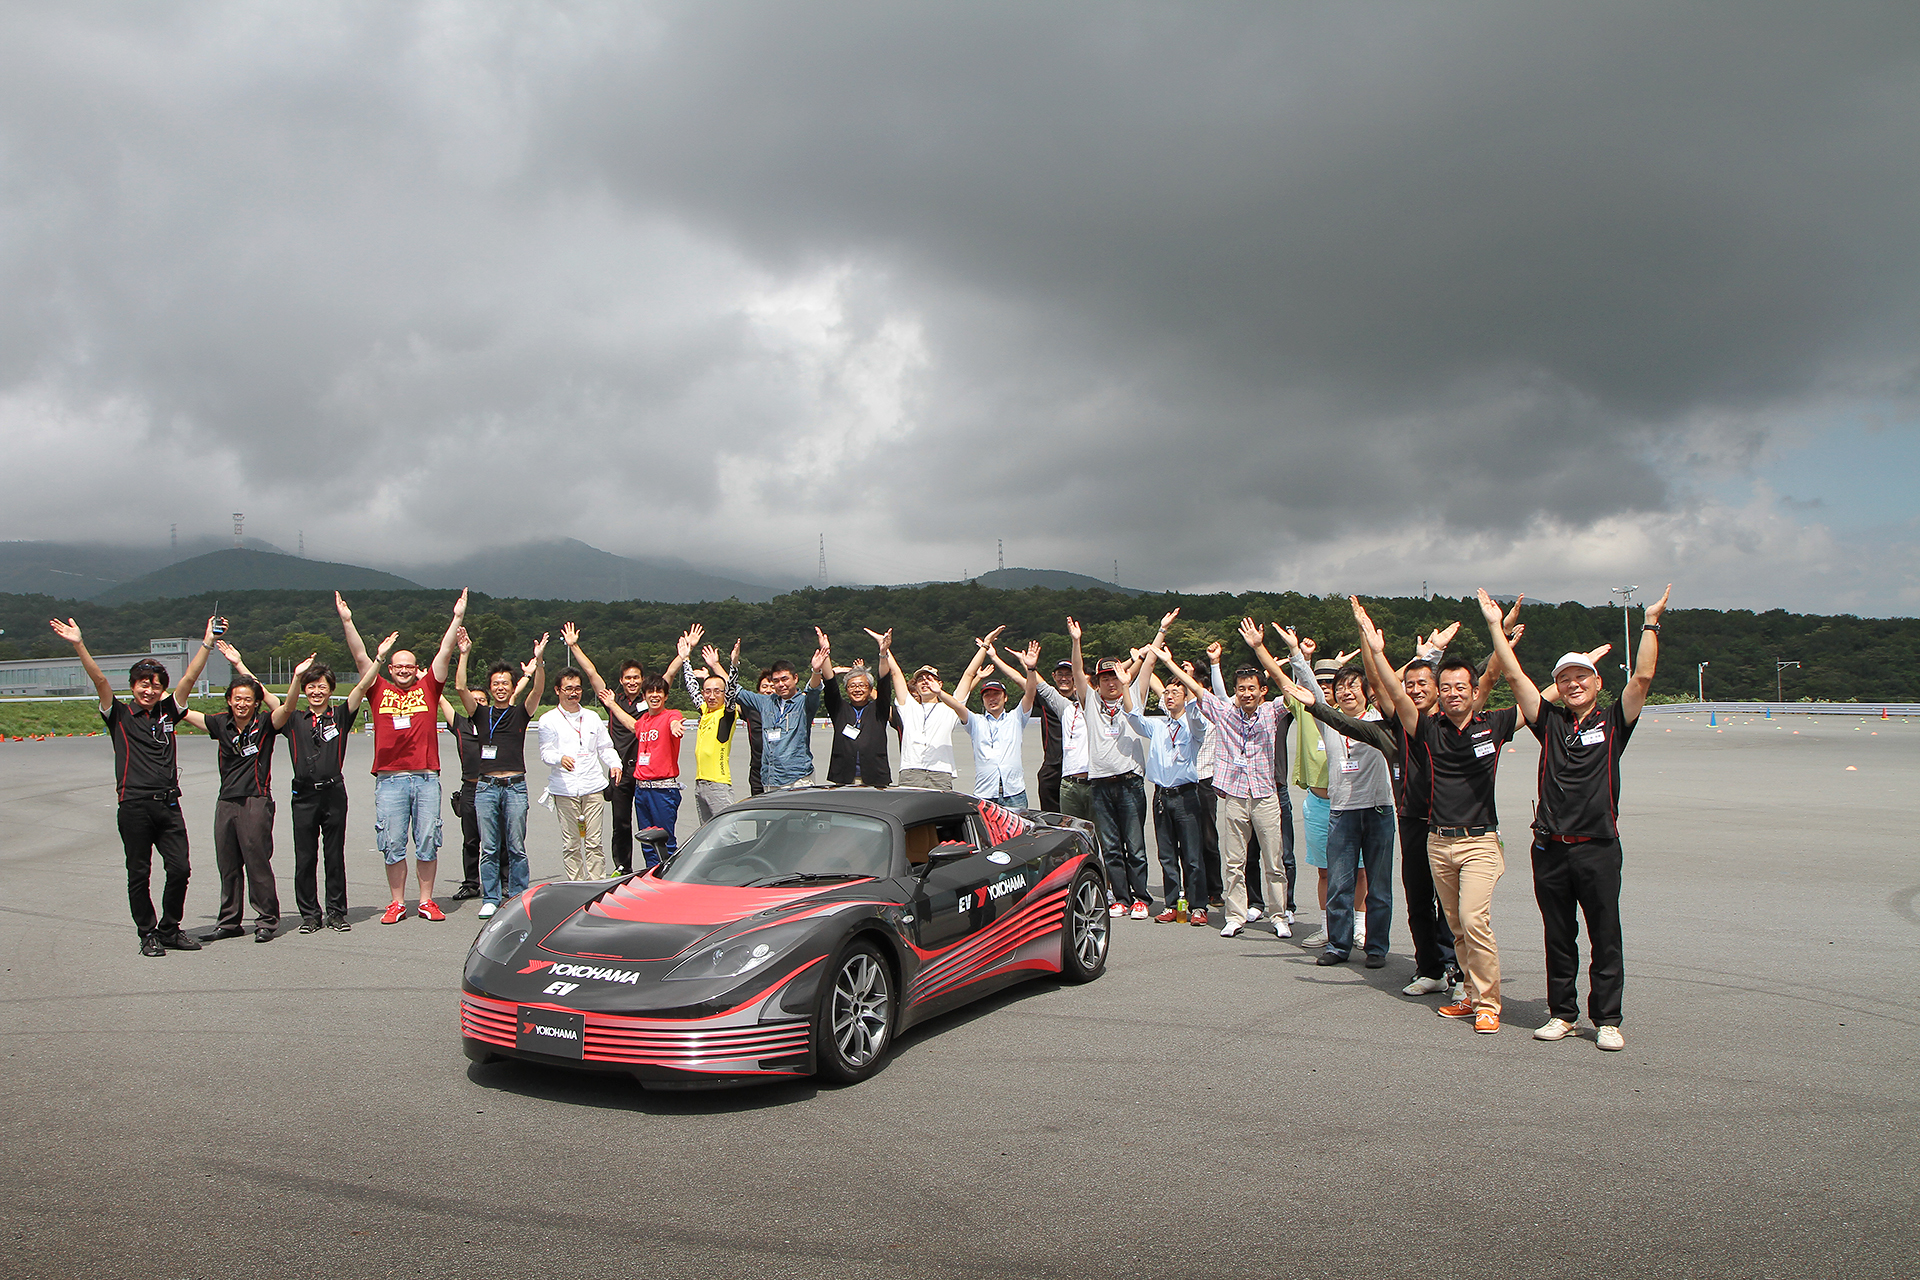 Dino-Fuji-Driving-Course-02.jpg